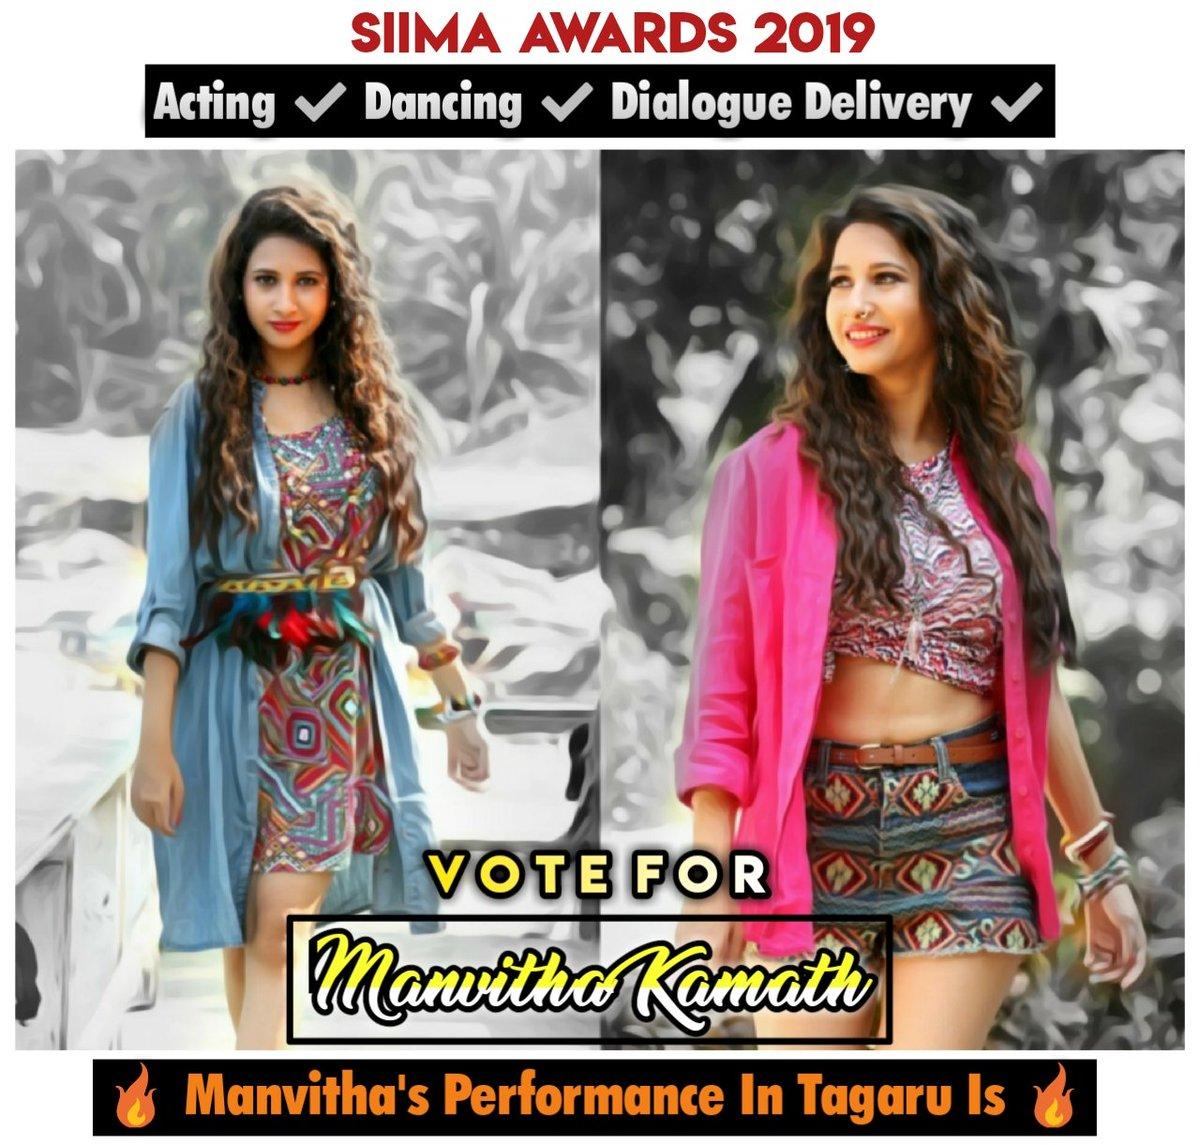 SIIMA Awards 2019 😍 Vote #Manvitha Mam For Her Brilliant